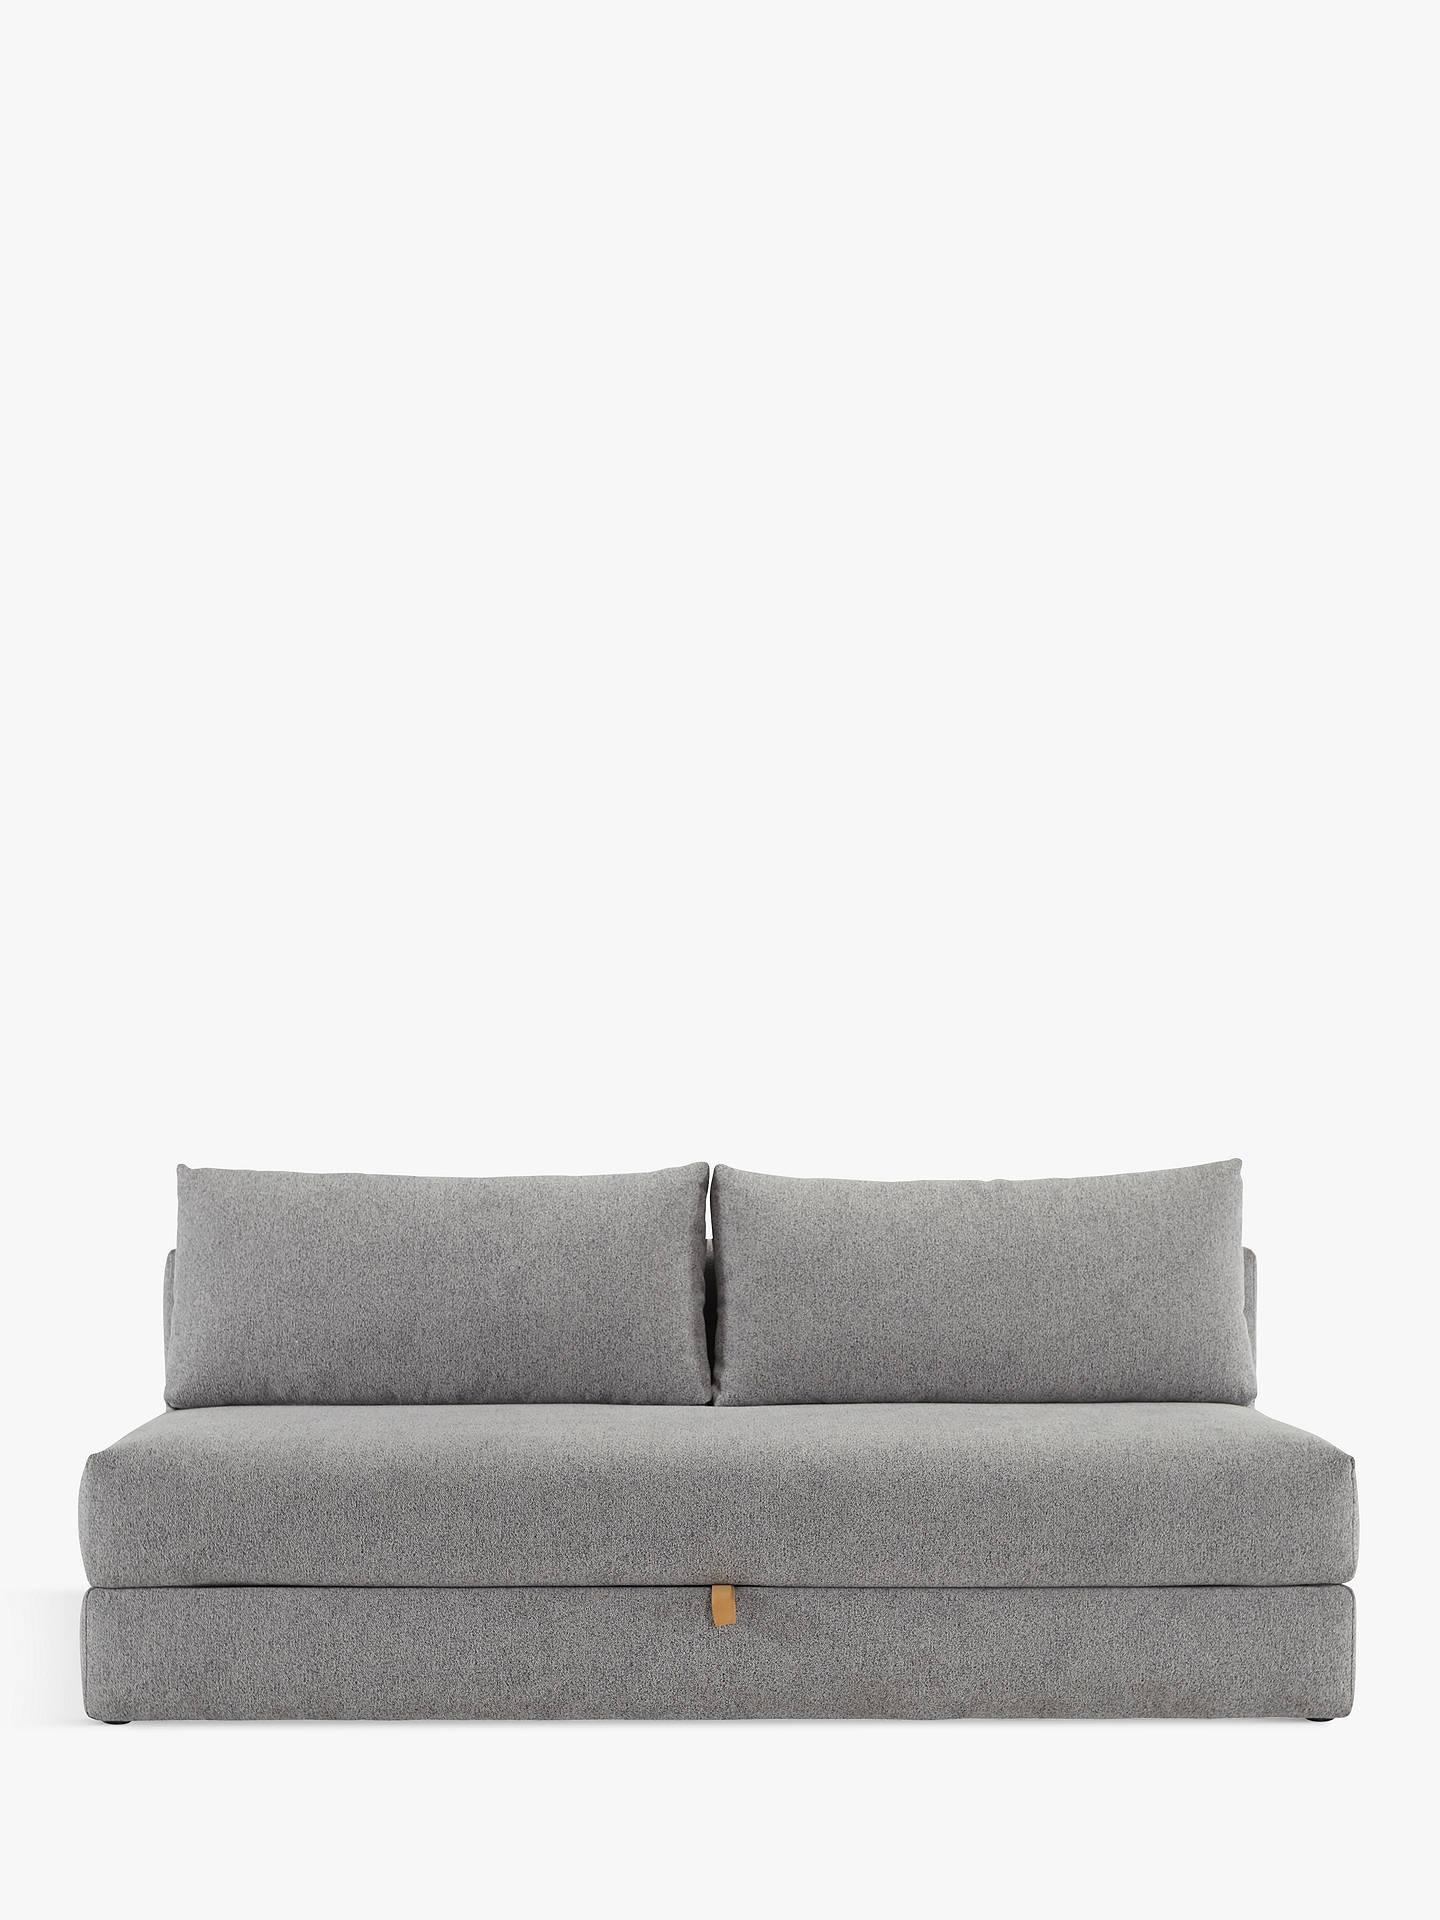 Wondrous Innovation Living Osvald Sofa Bed With Pocket Sprung Mattress Dark Leg Melange Light Grey Ocoug Best Dining Table And Chair Ideas Images Ocougorg